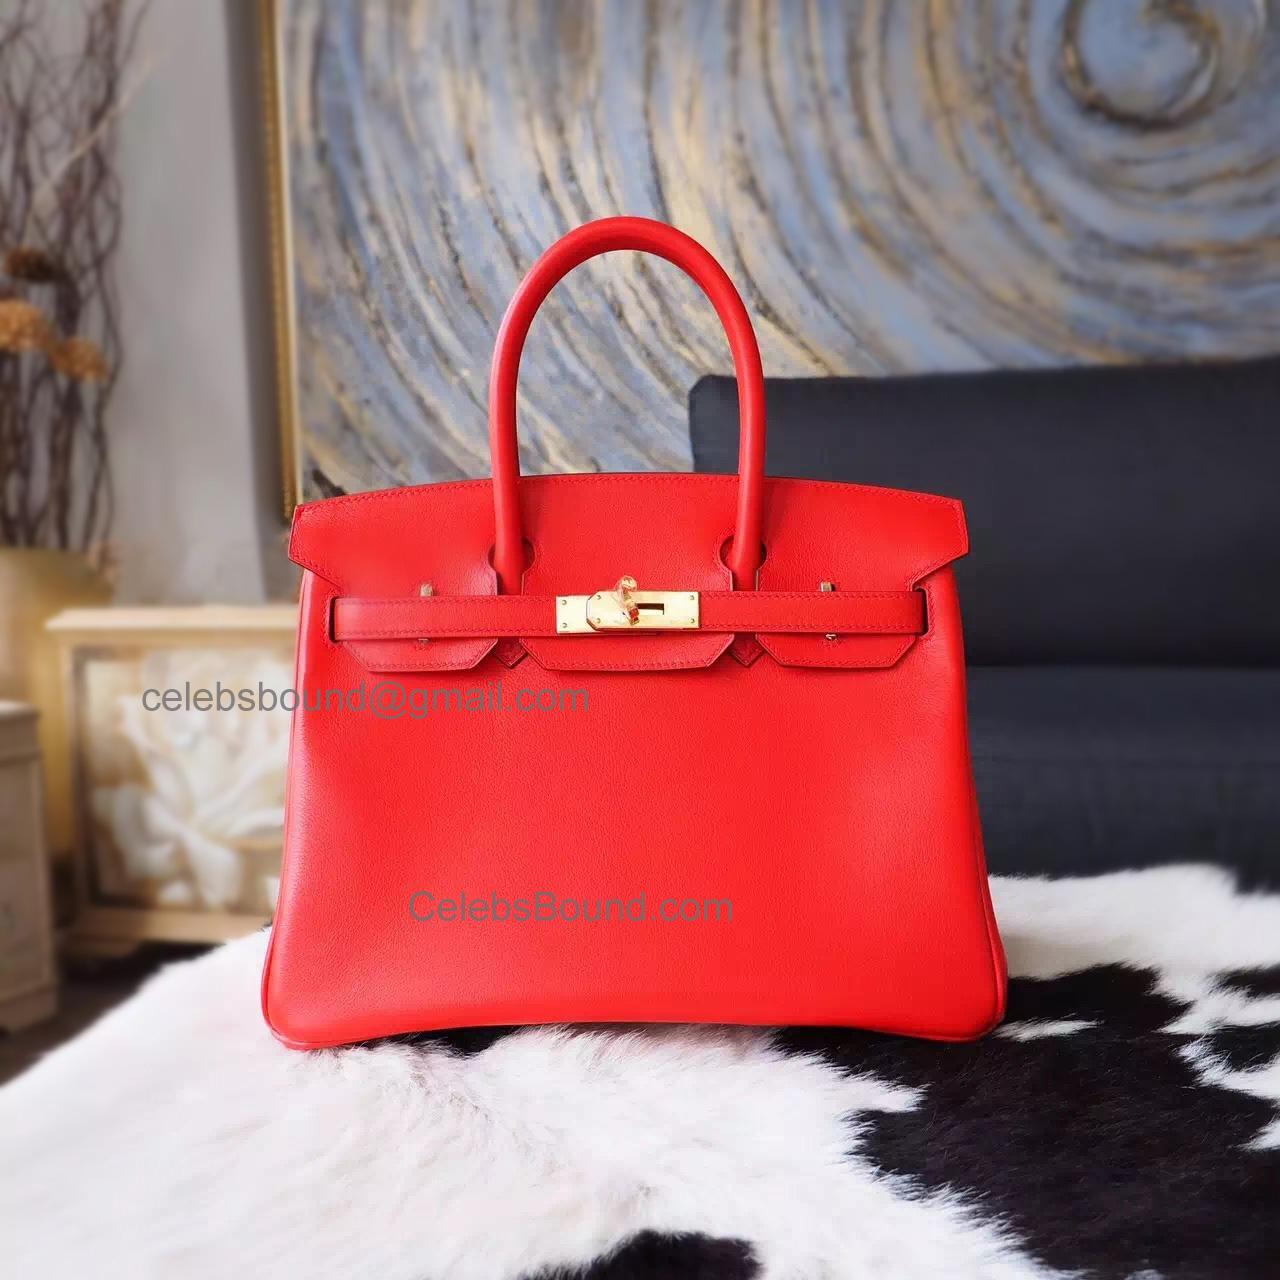 30816df37d Hand Stitched Hermes Birkin 30 Bag in q5 Rouge Casaque Swift Calfskin GHW